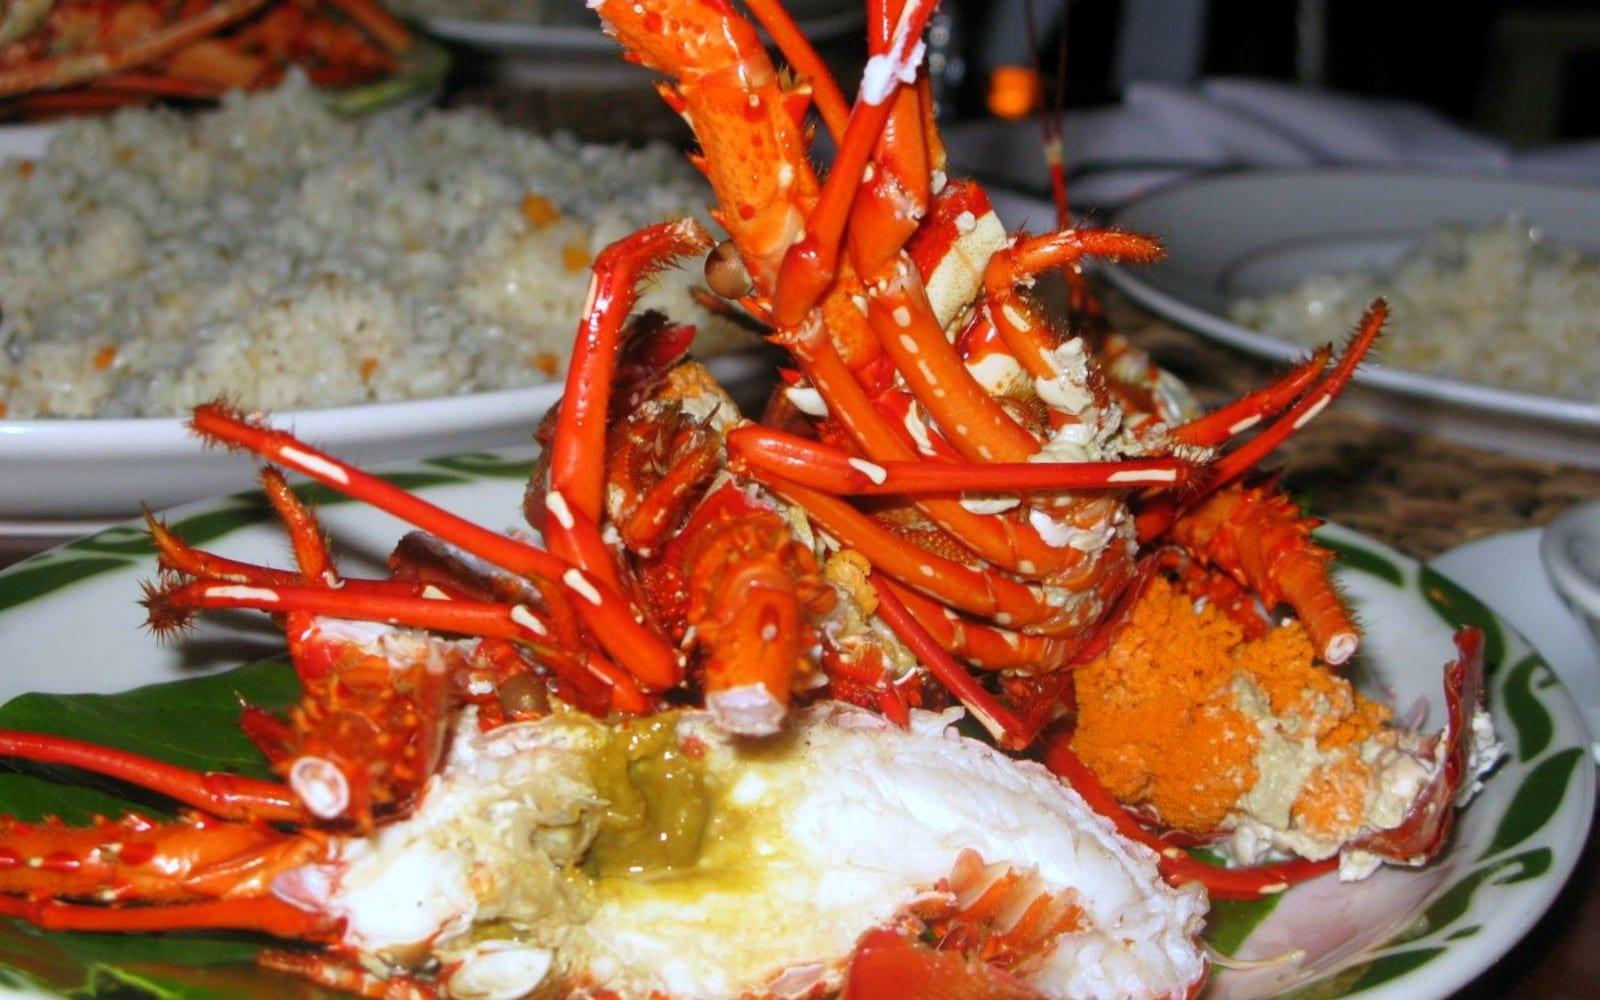 A delicious lobster dinner in El Nido, Palawan